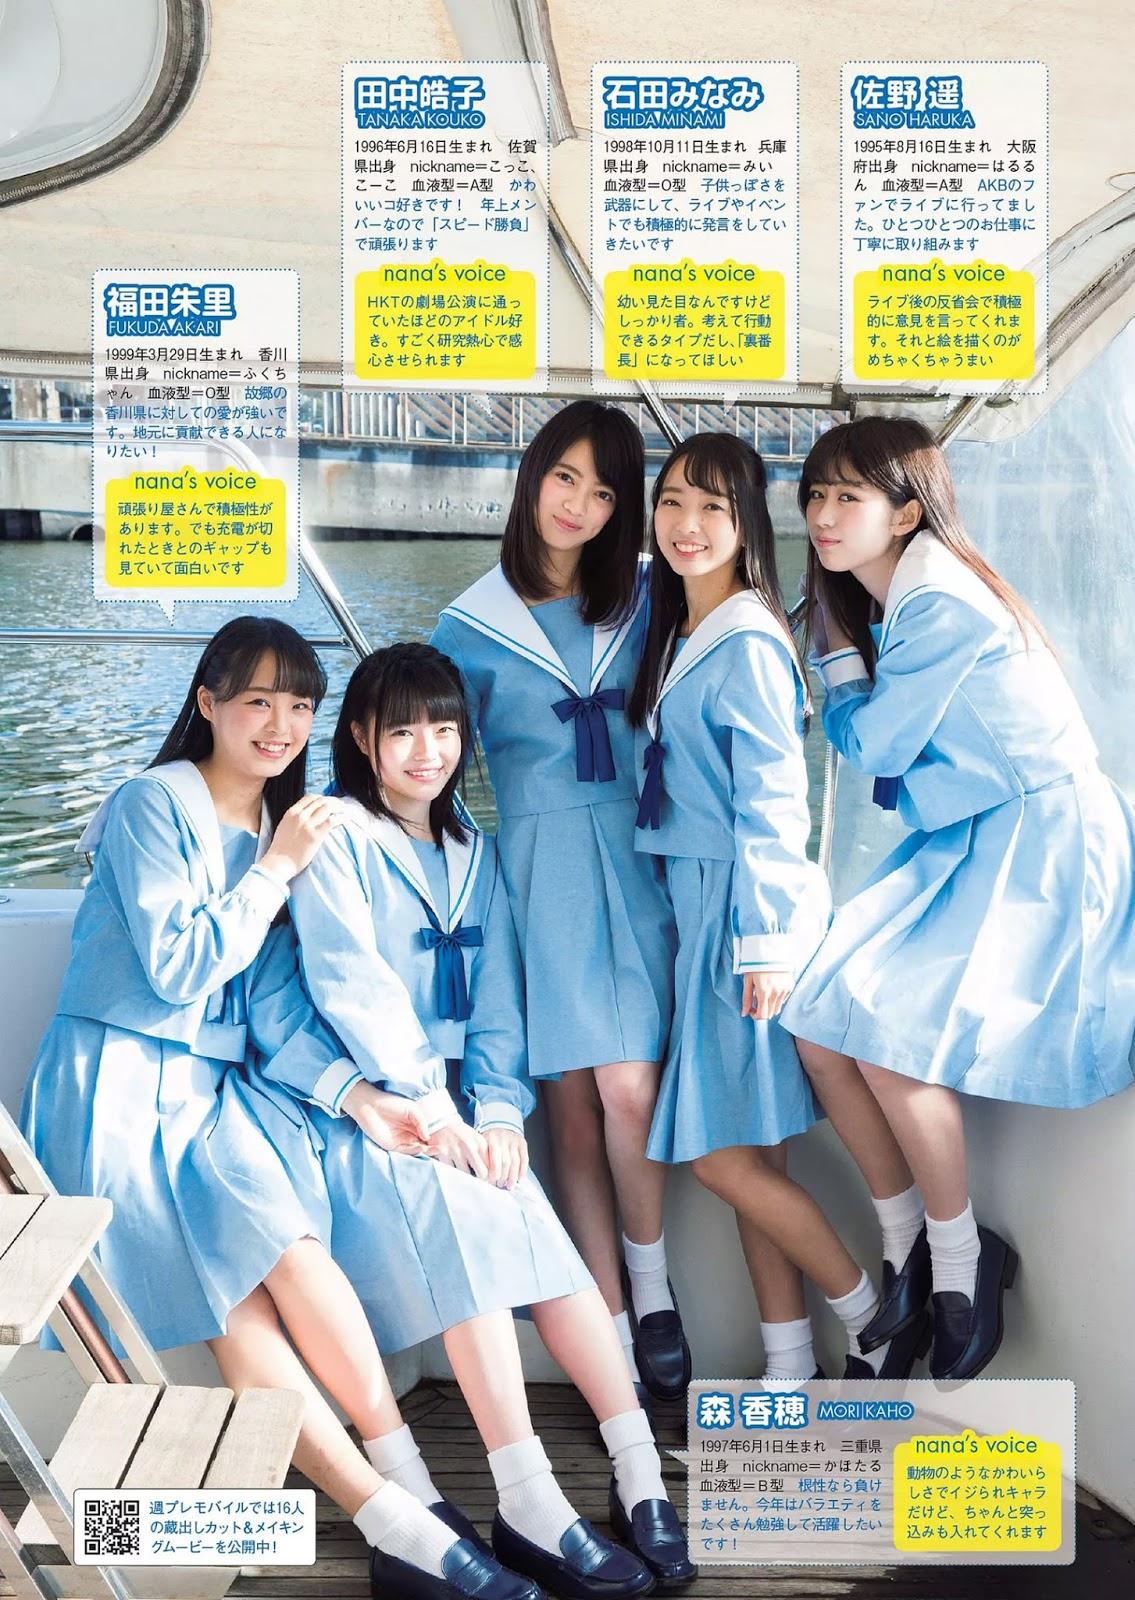 STU48, Weekly Playboy 2018 No.07 (週刊プレイボーイ 2018年07号)